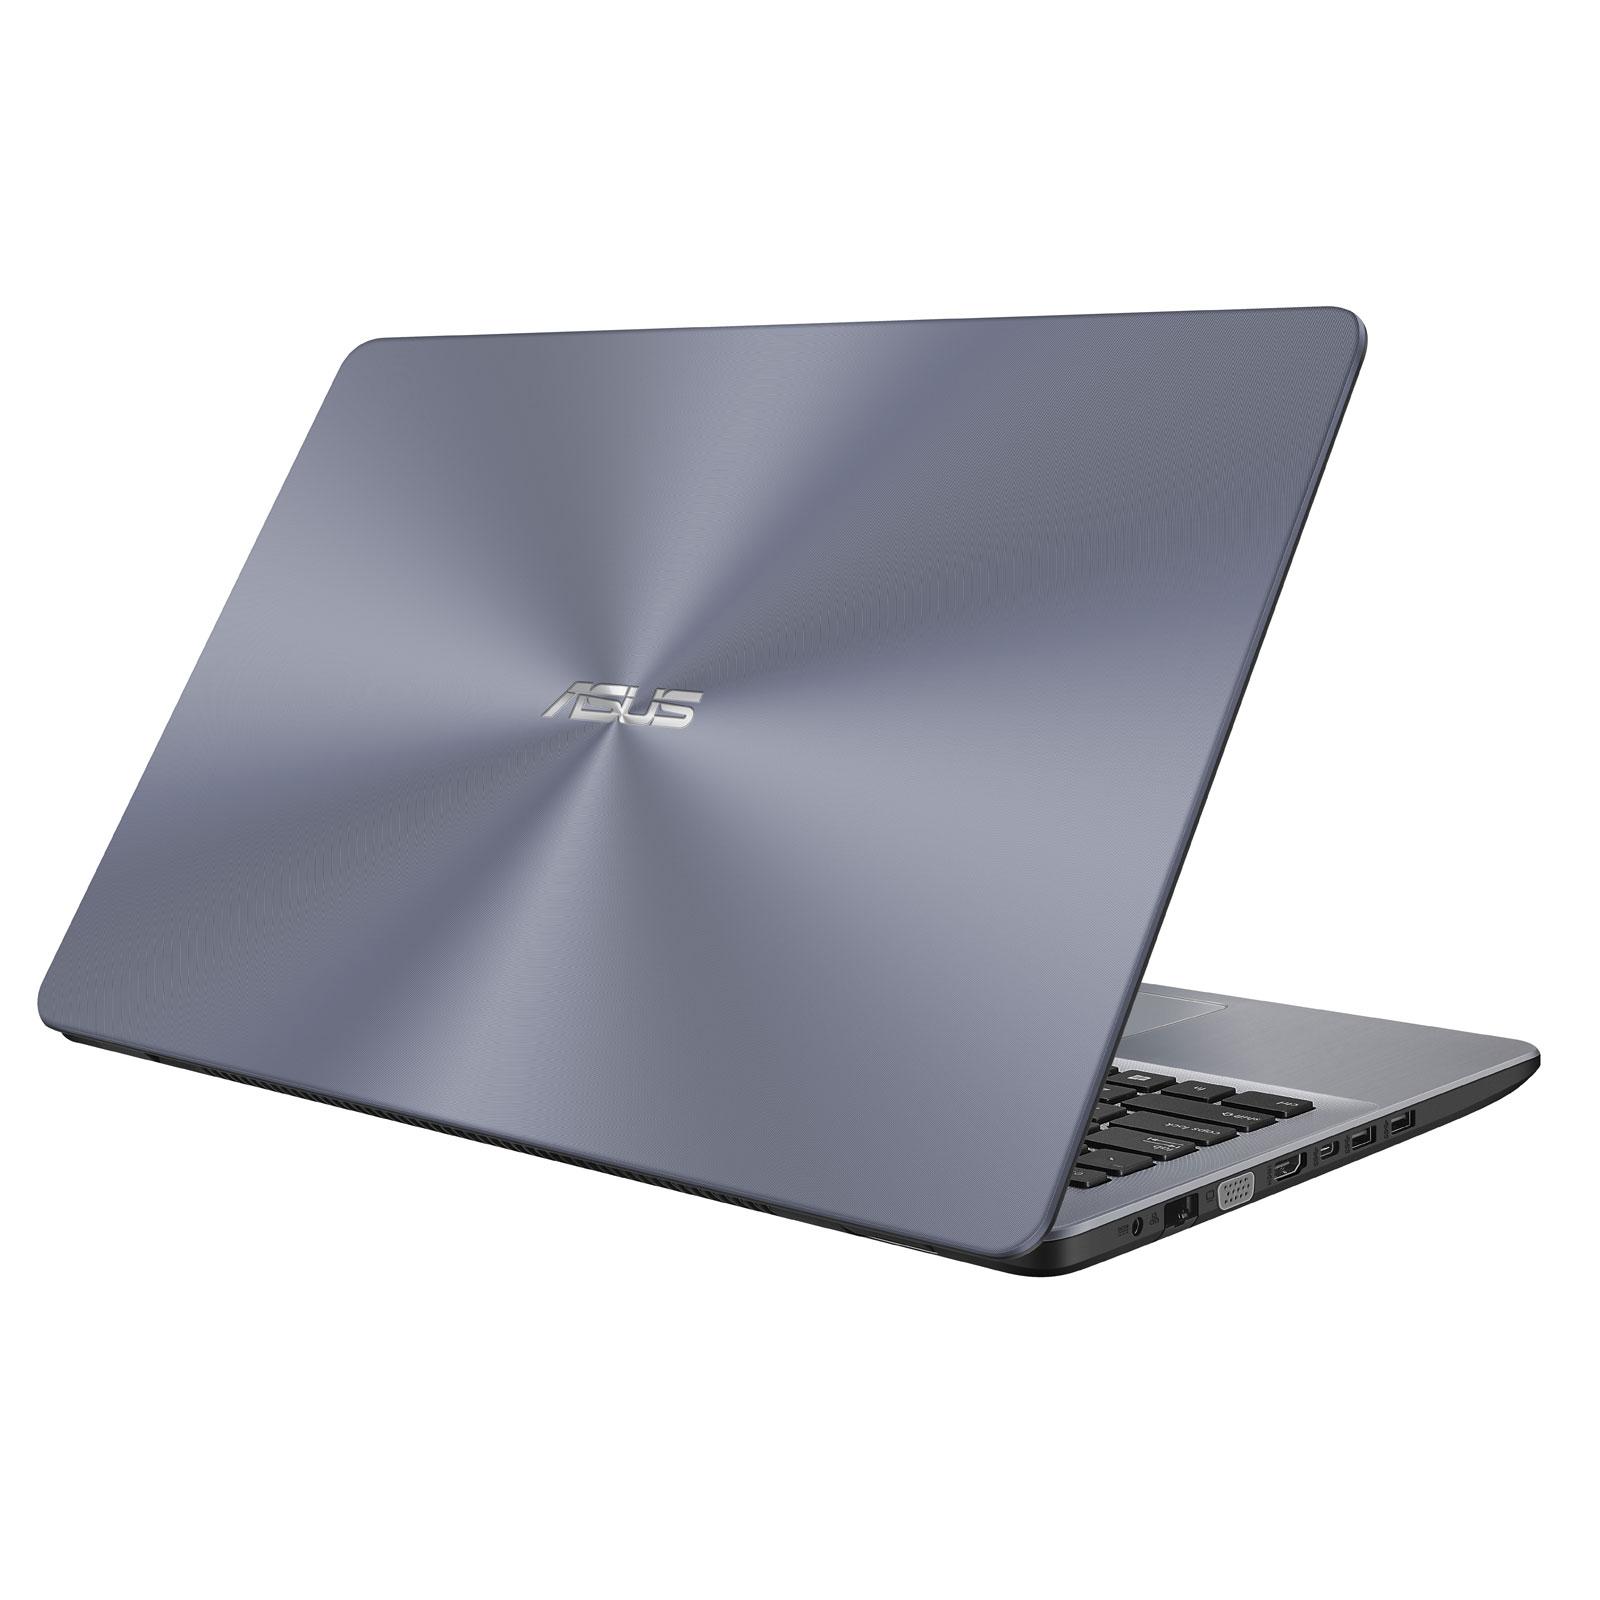 P1501UA-DM914R (90NB0F22-M12650) - Achat / Vente PC portable sur Picata.fr - 2